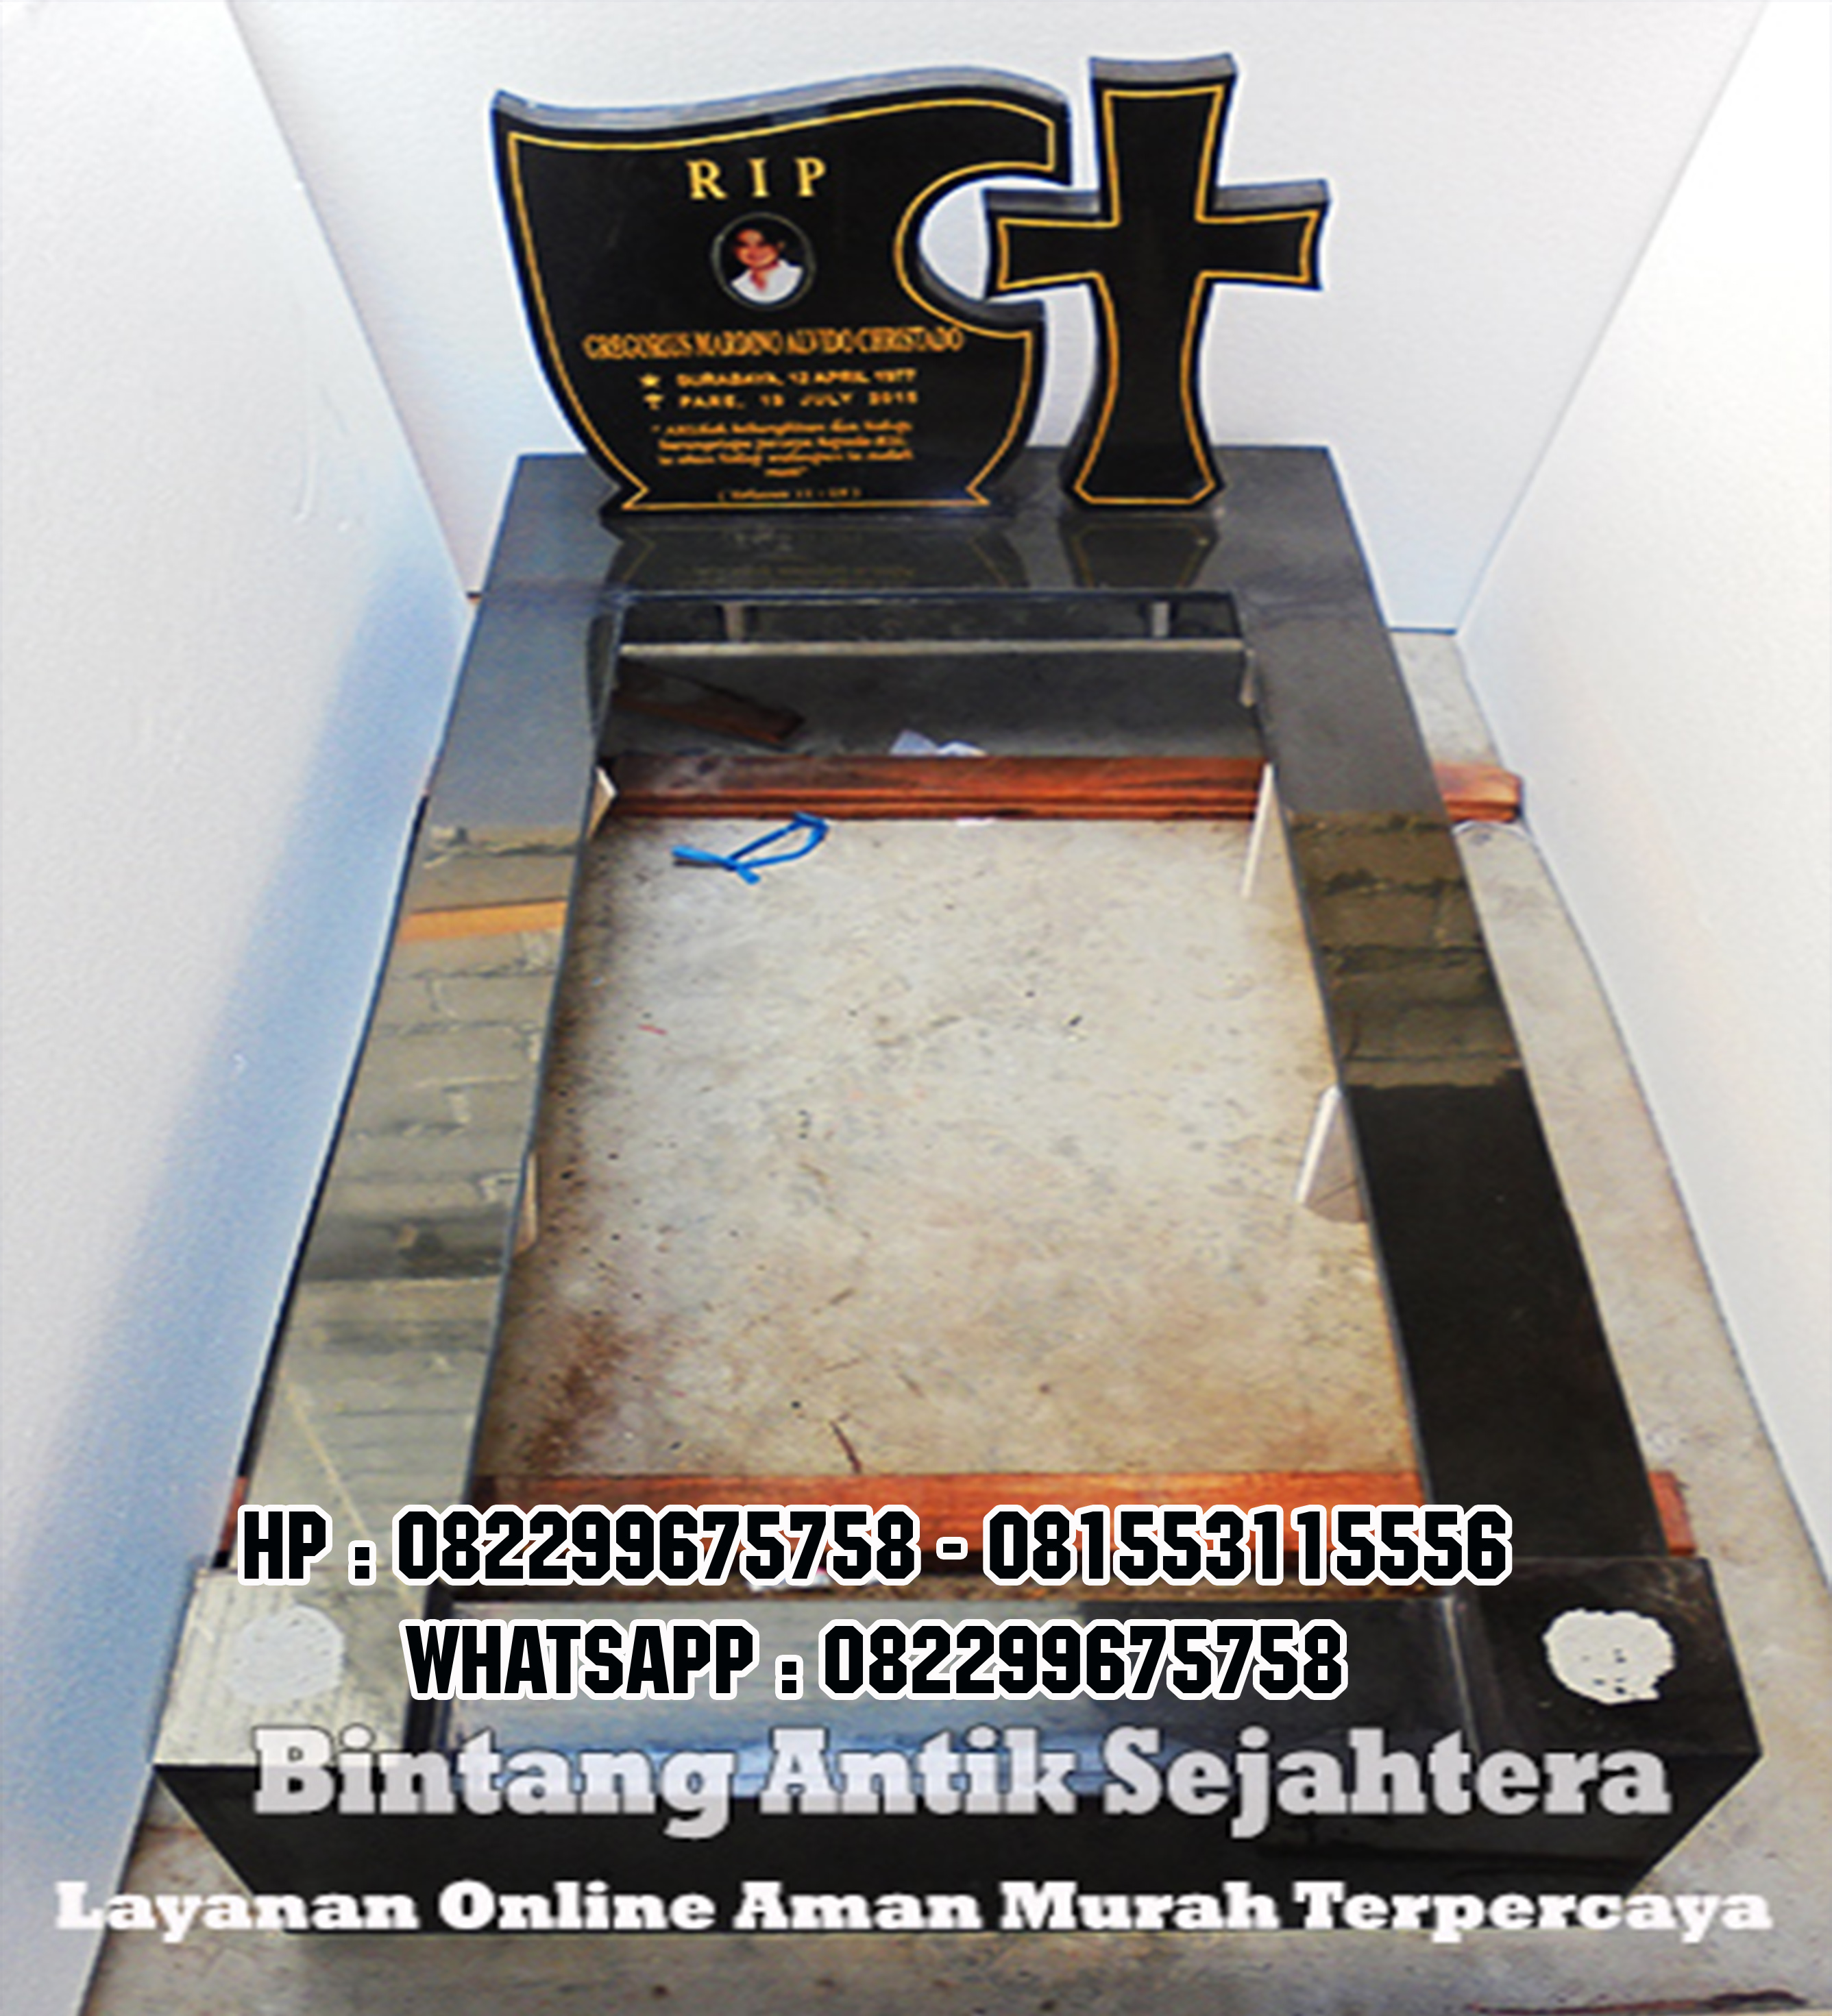 Model Kuburan Eropa Modern-Model Makam Granit Eropa-Model Makam Kristen-Model Makam Modern-Model Makam Eropa